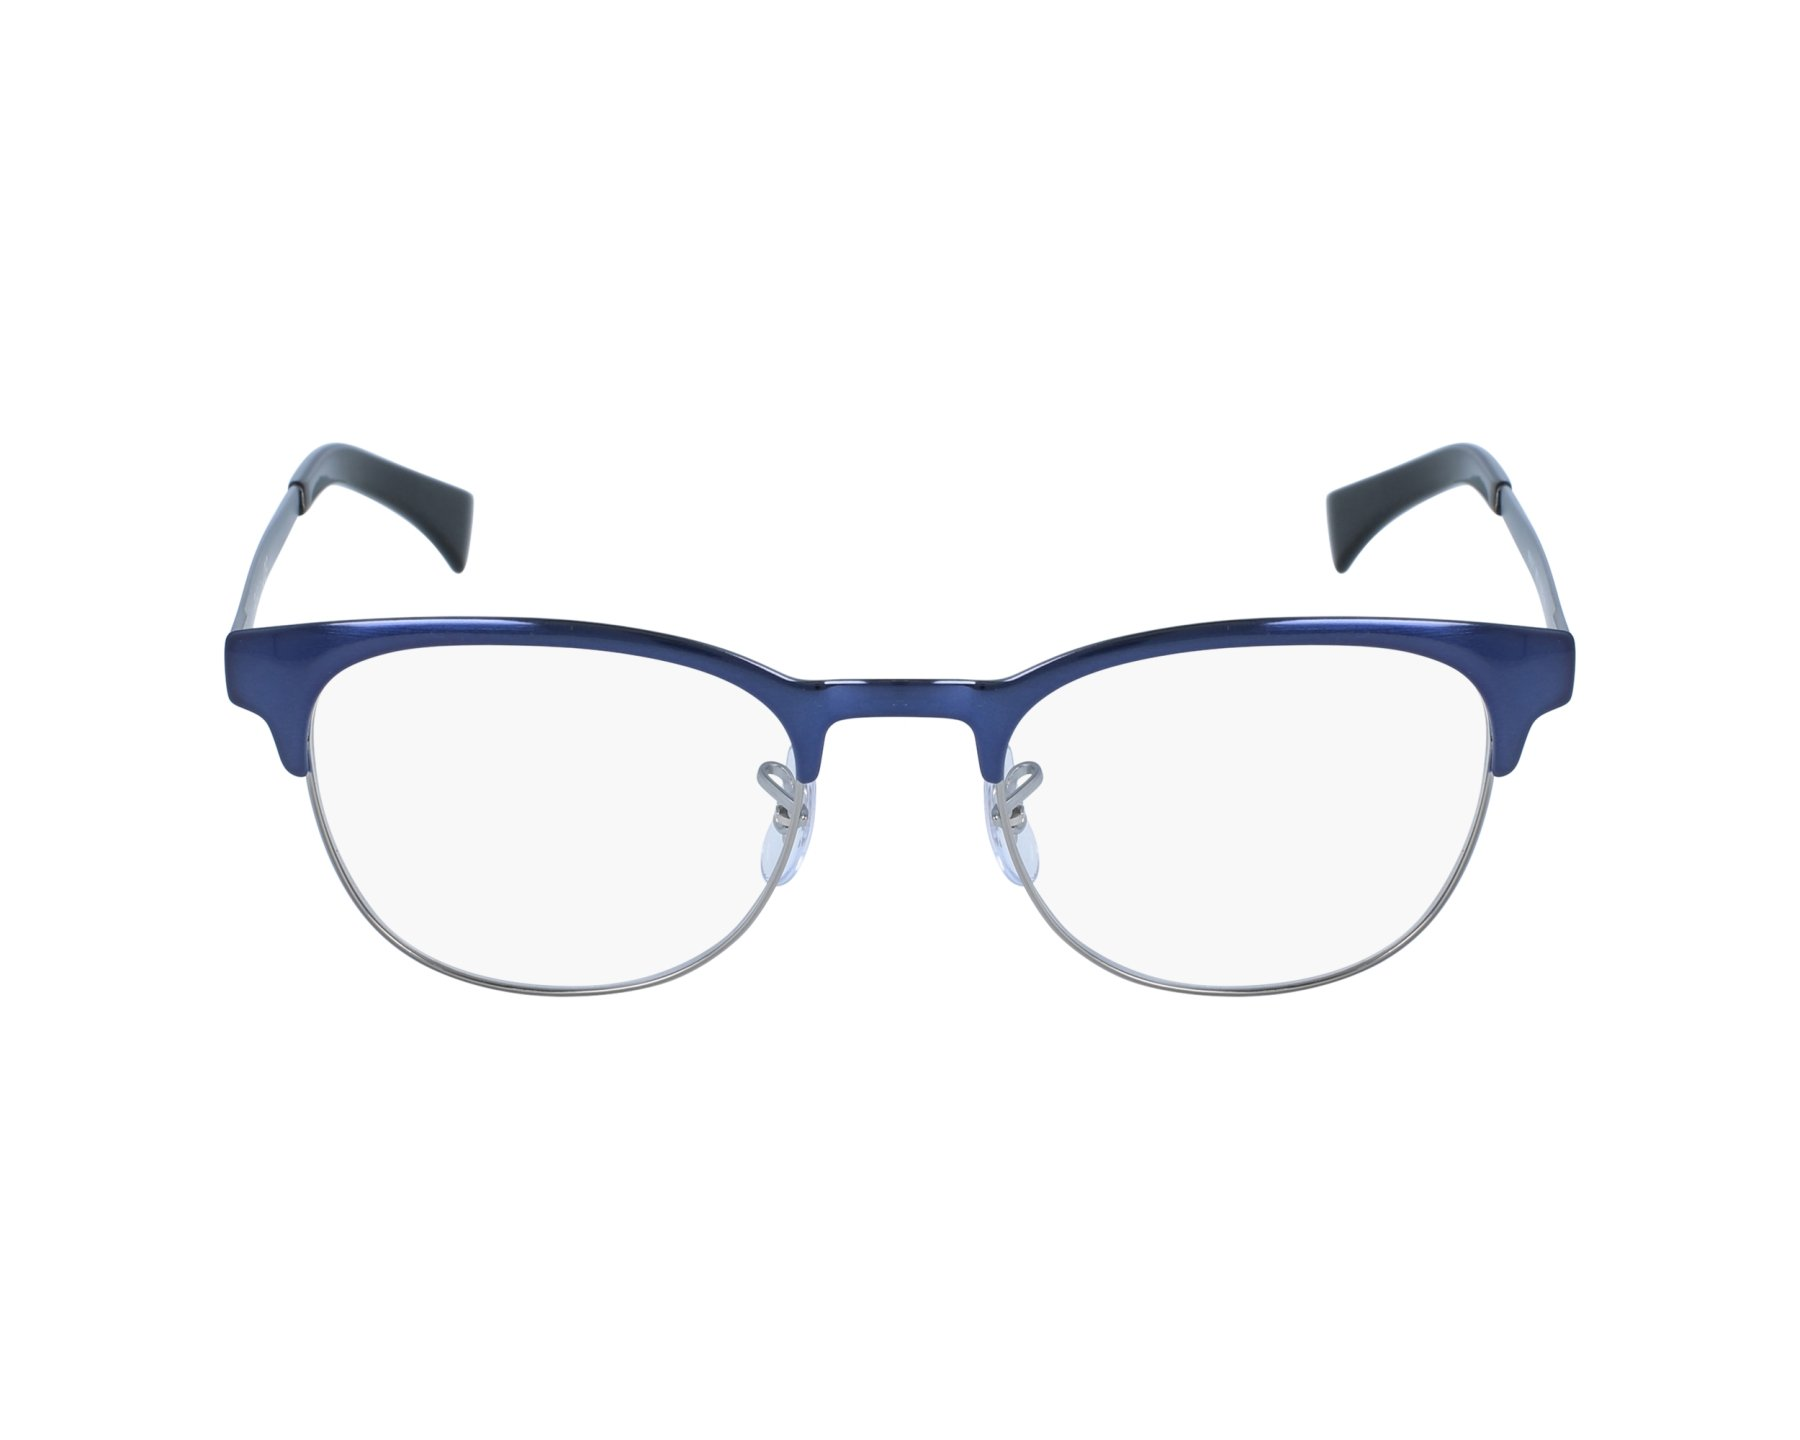 80fc1e7005 eyeglasses Ray-Ban RX-6317 2863 49-20 Blue Silver profile view